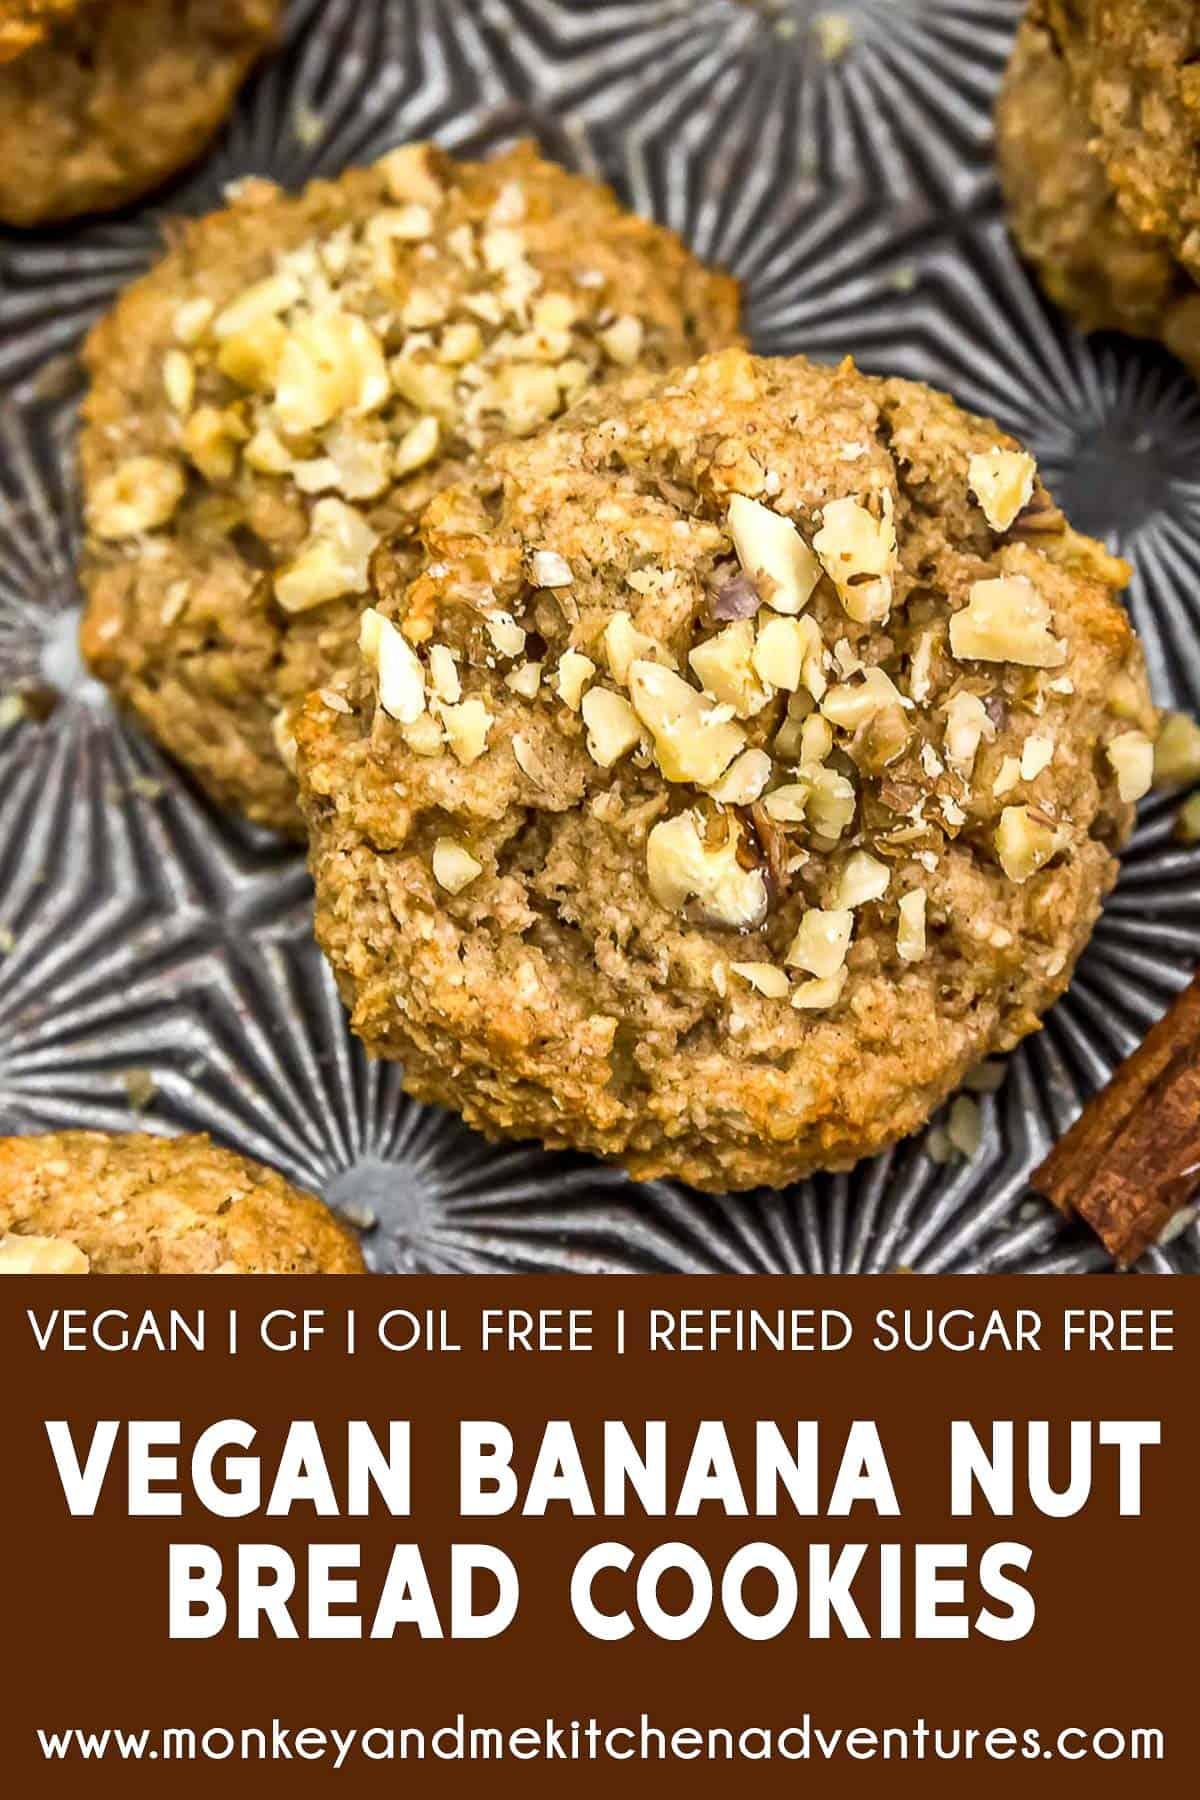 Vegan Banana Nut Bread Cookies with text description